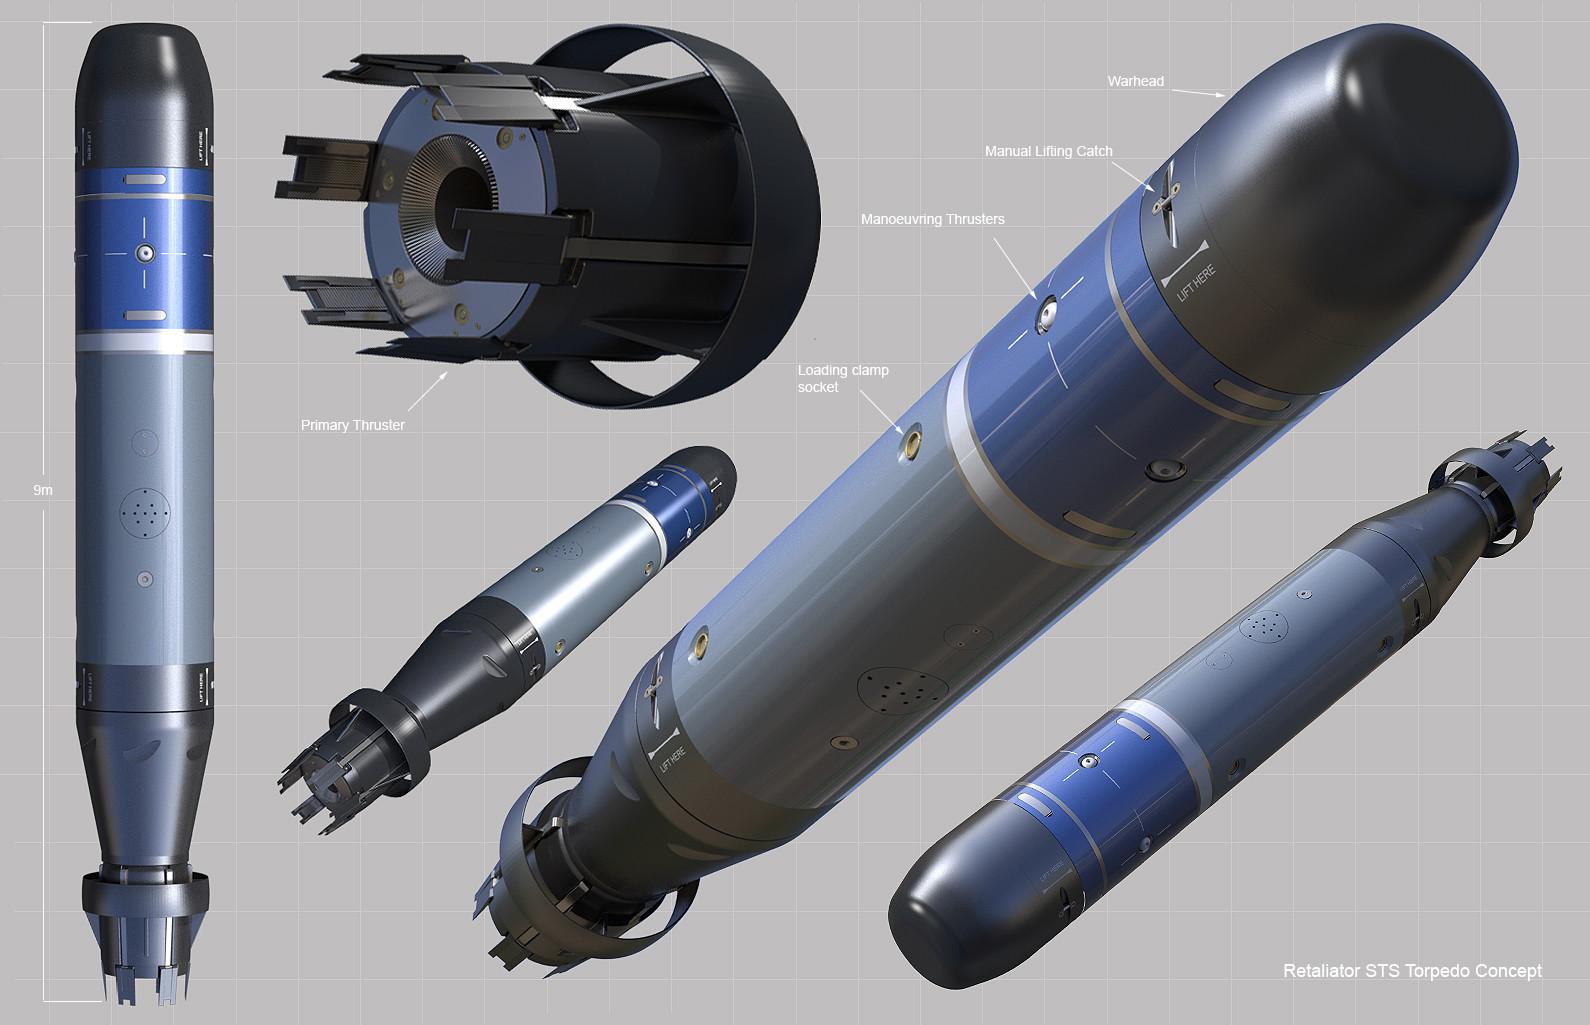 andrew-ley-torpedorender-001.jpg